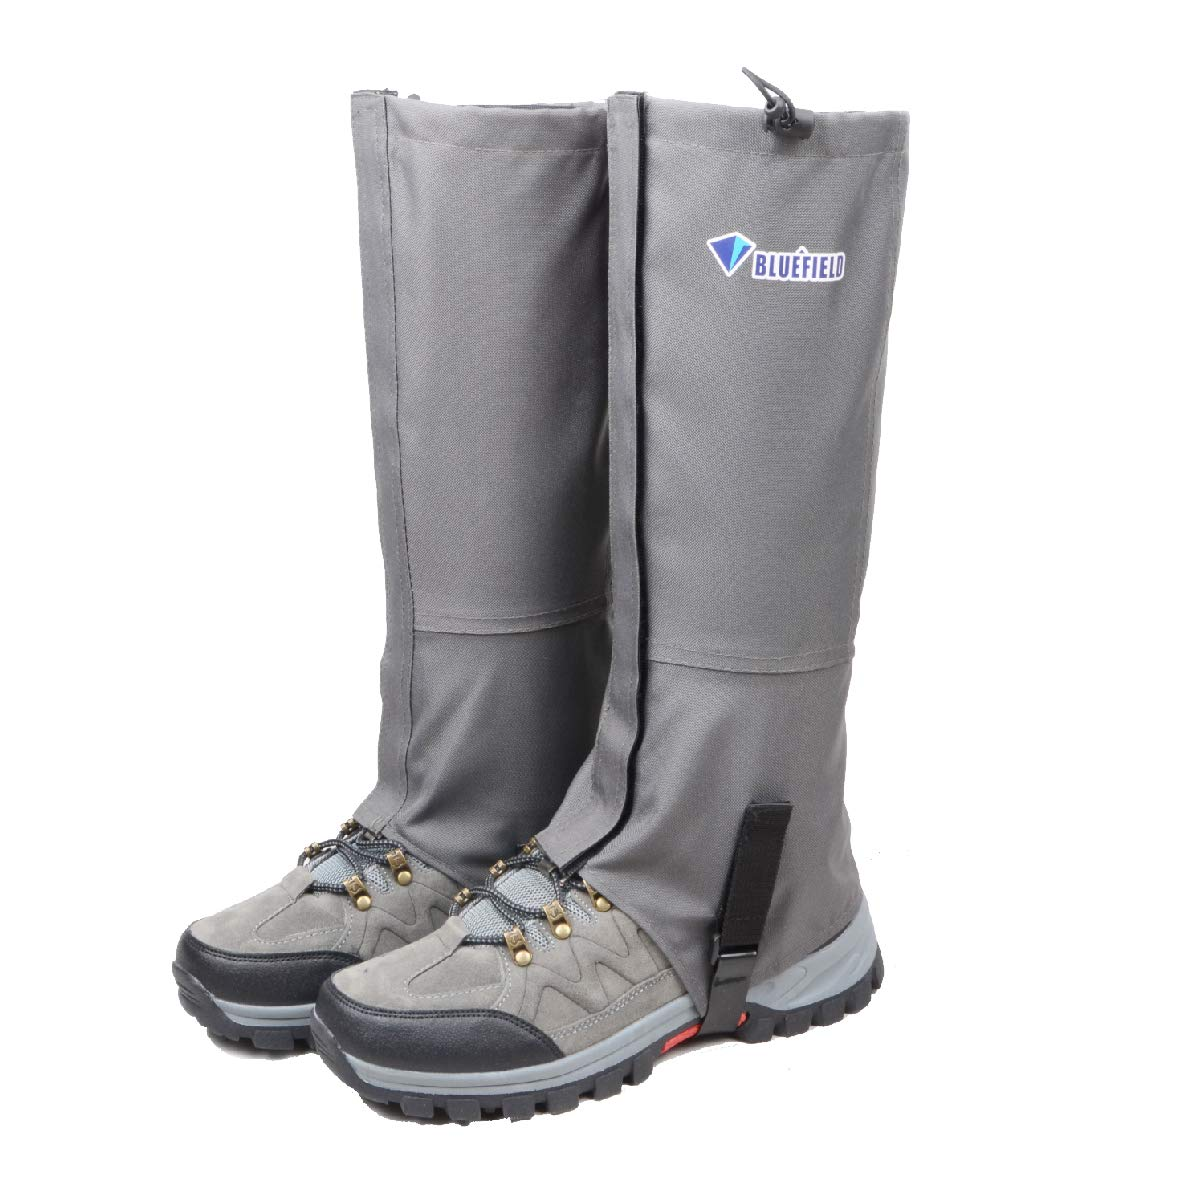 TRIWONDER Leg Gaiters Waterproof Snow Boot Gators Hiking Gaiters Men Women for Walking Climbing Hunting Cycling Backpacking Lightweight Rain Shoe Gaiters (1 Pair) (Grey, XL) by TRIWONDER